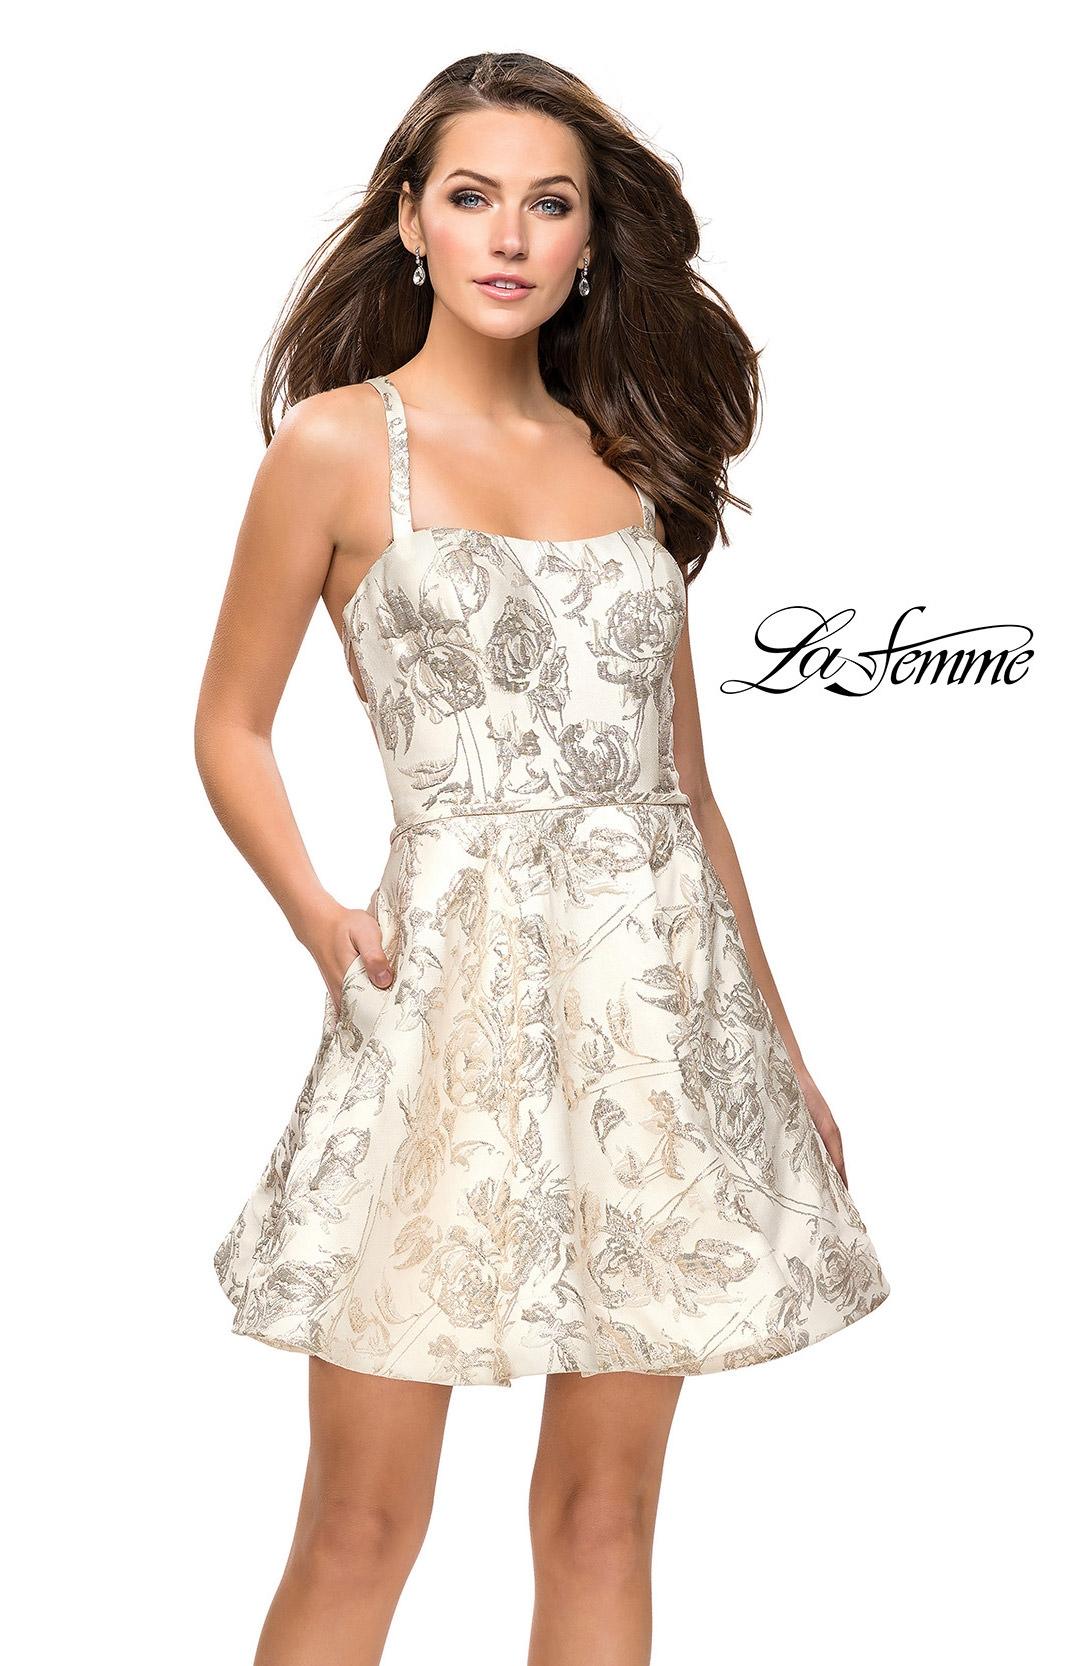 6e5fca41155f La Femme 26656 - Short A-Line Open Back Prom Dress